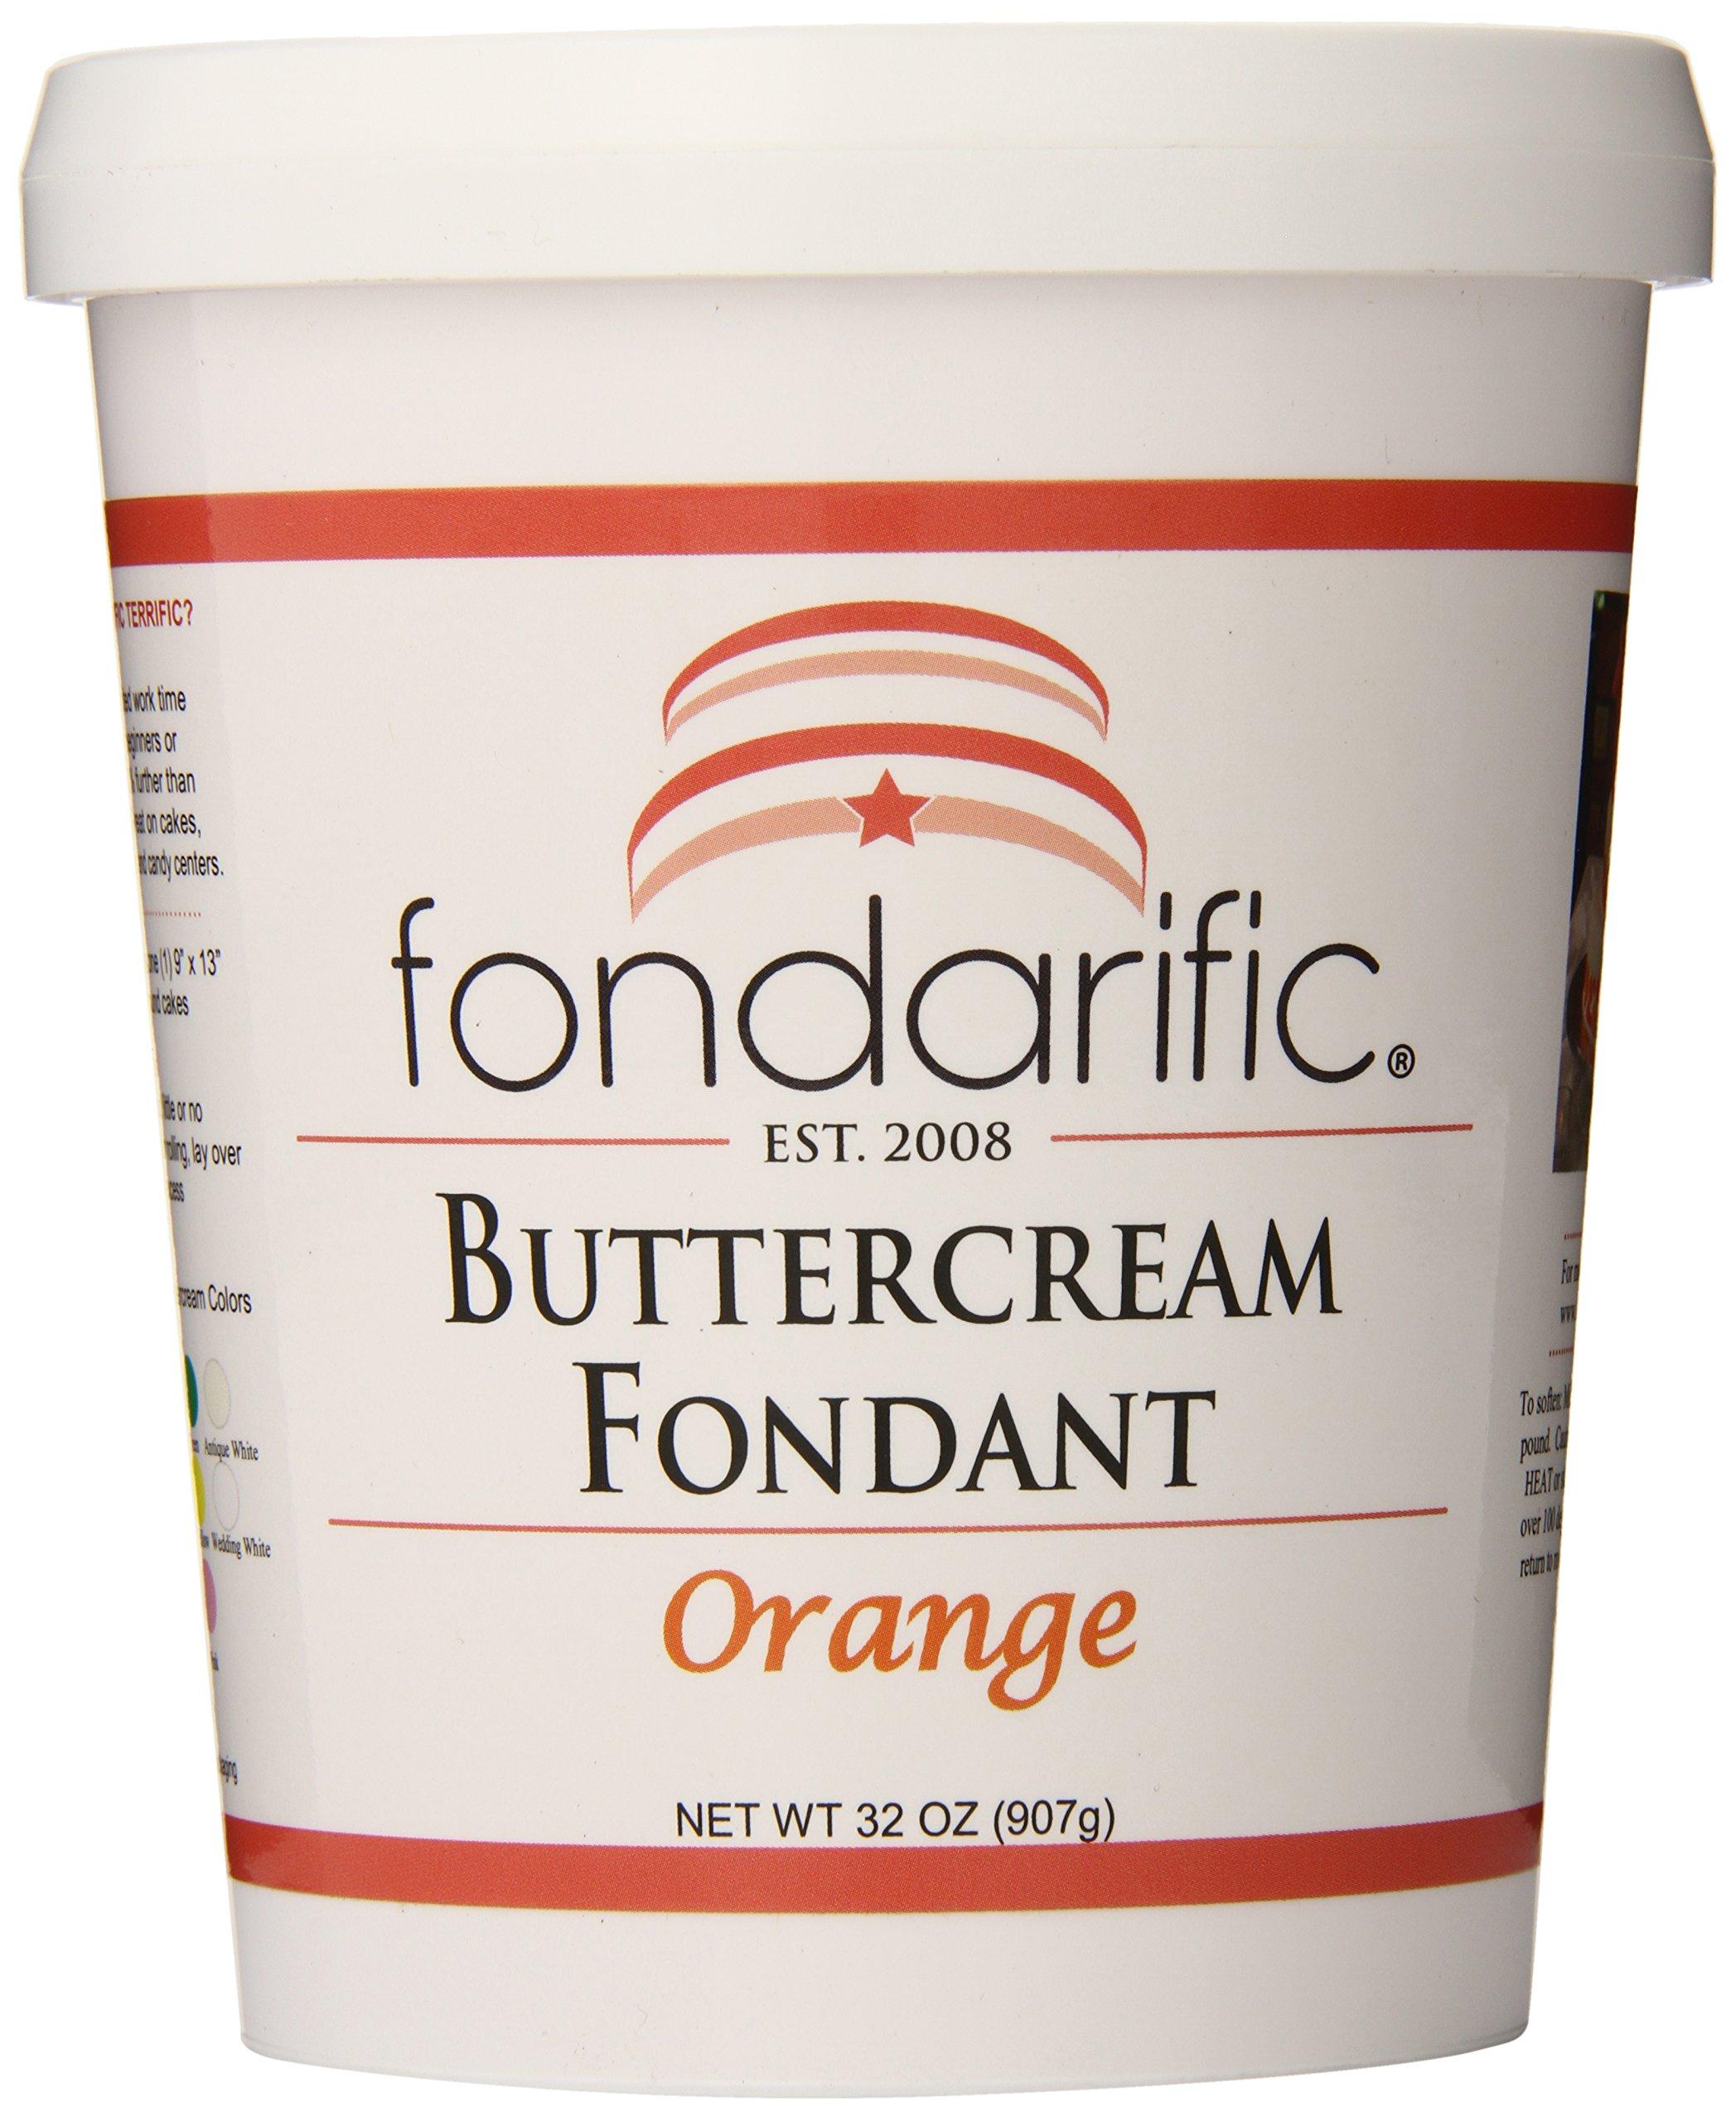 Fondarific Buttercream Orange Fondant, 2-Pounds